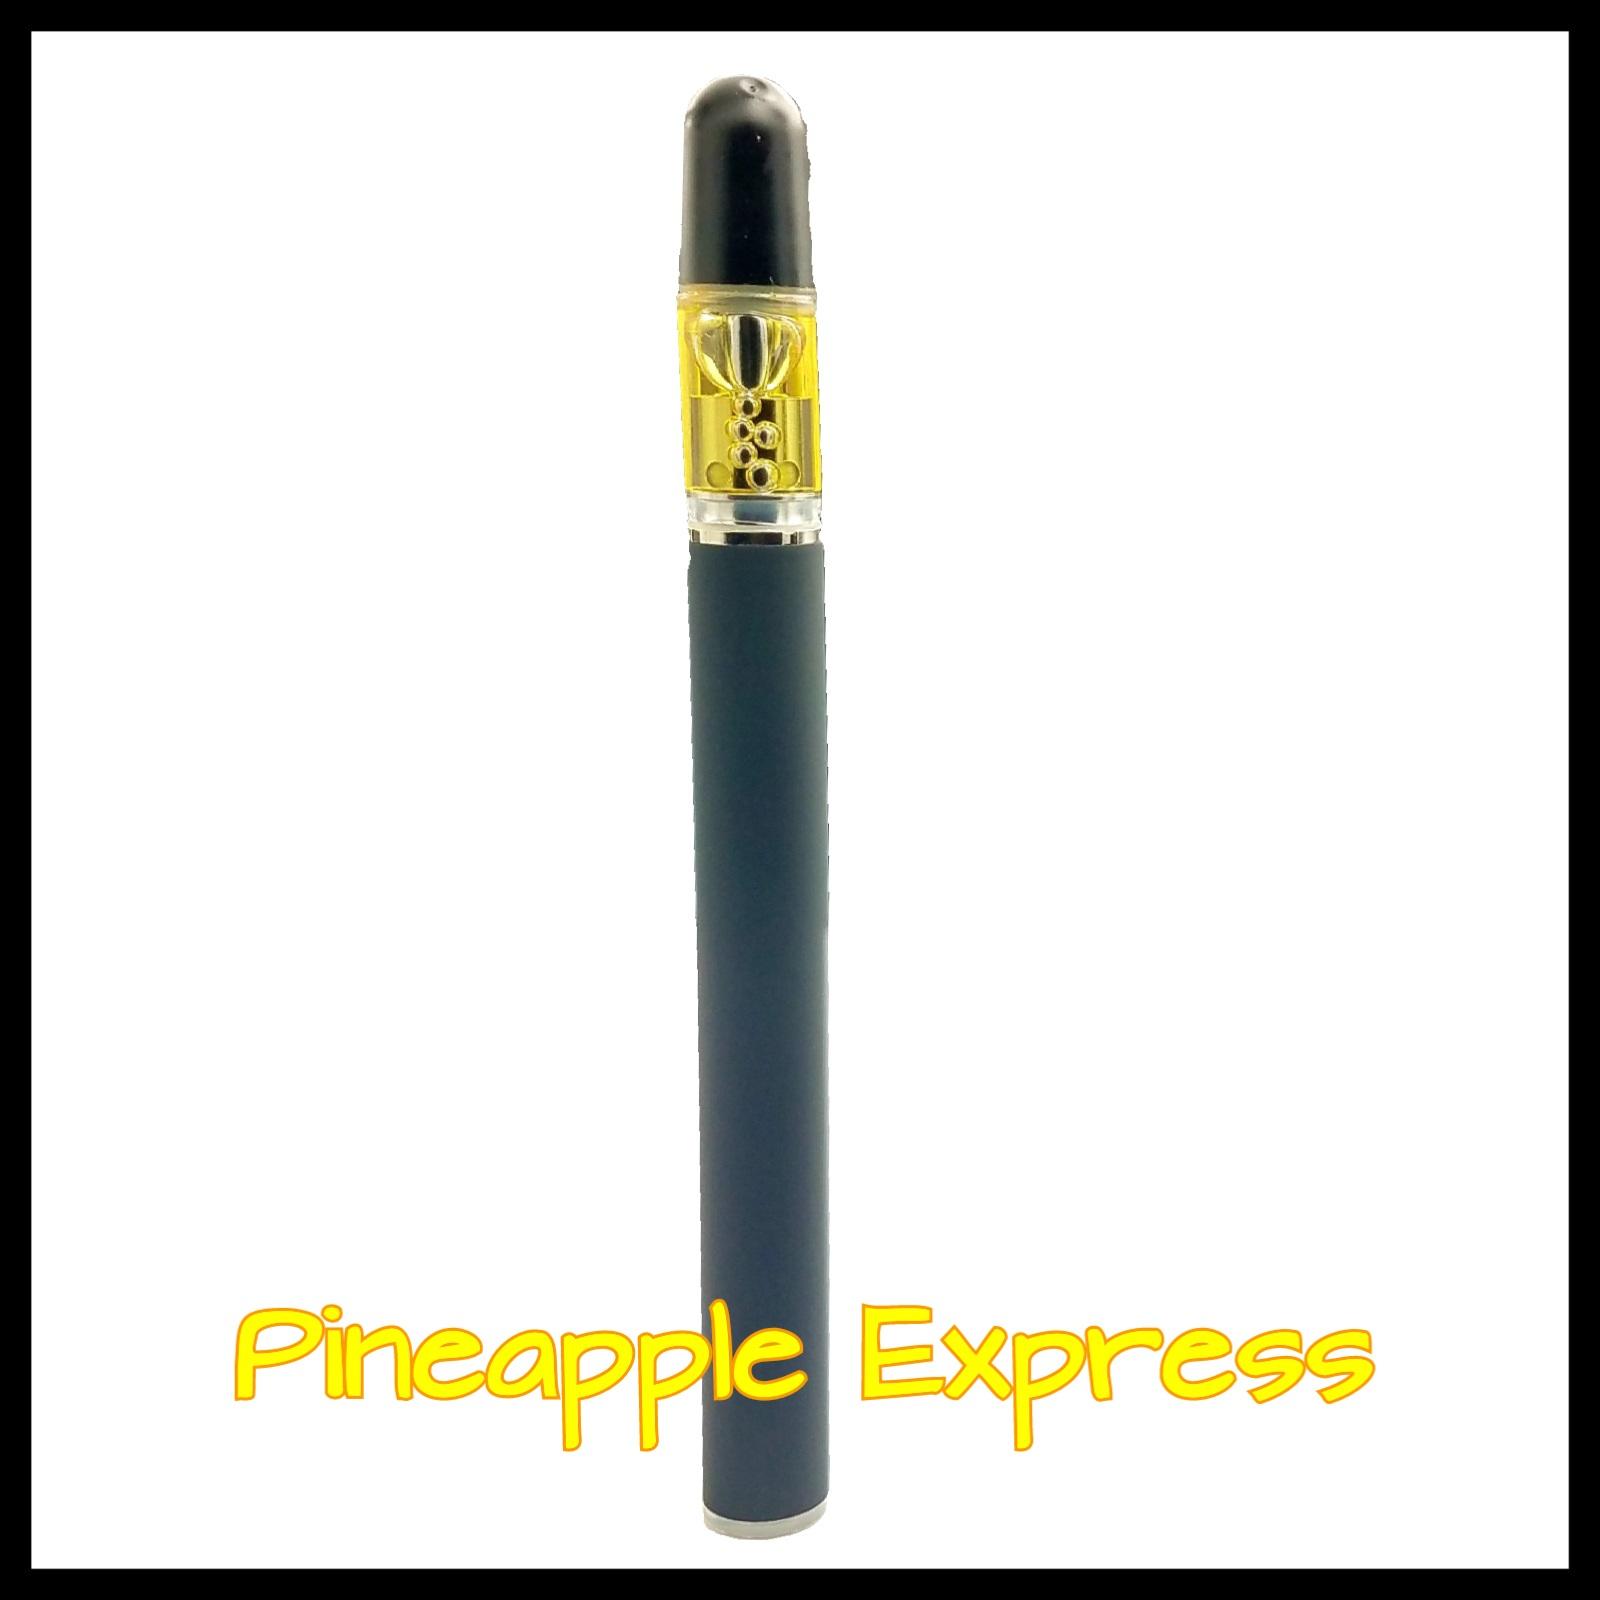 SNX - Pineapple Express (Black Label) Ultra Refined Oil Pen